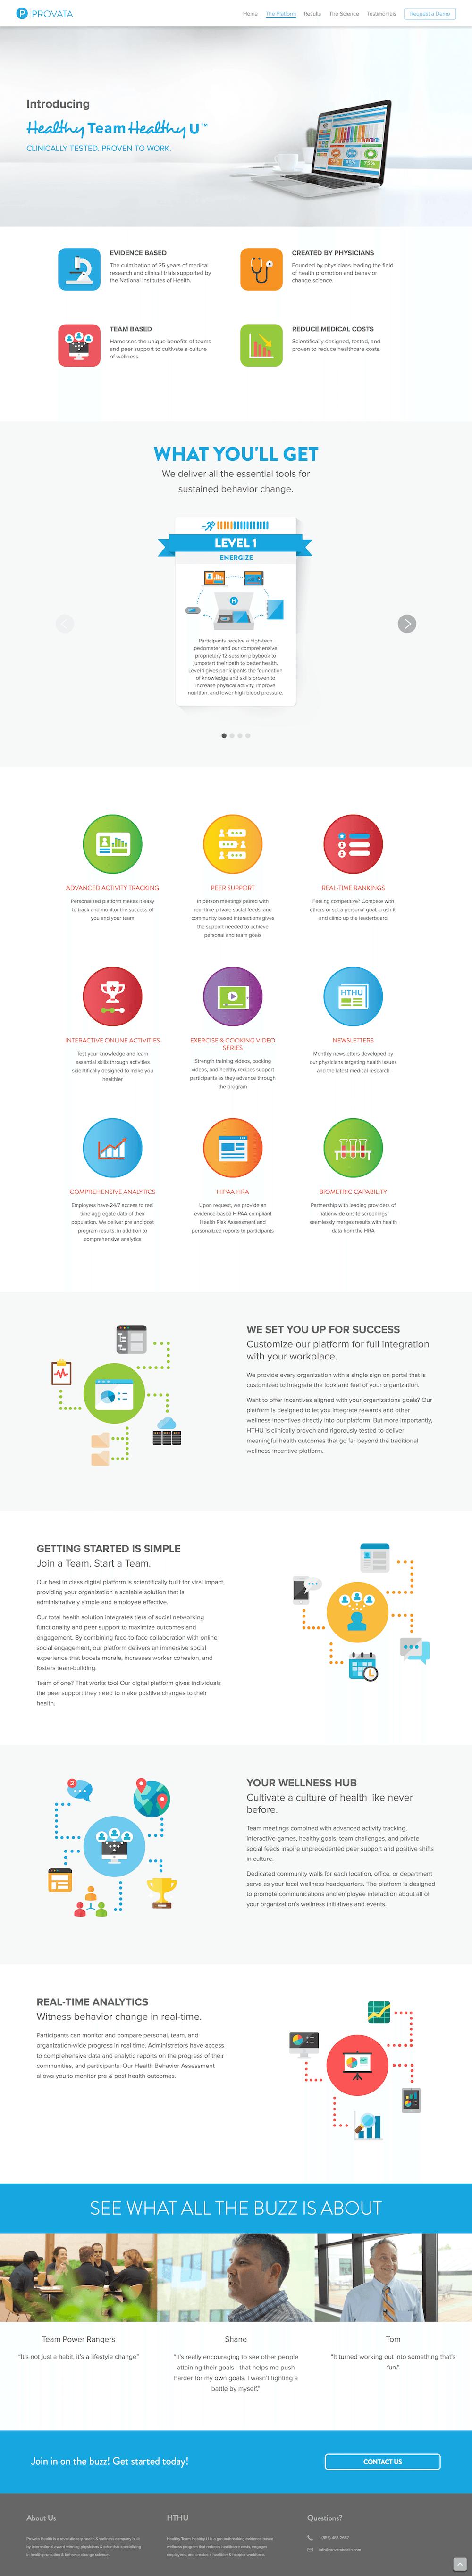 Screenshot of the Provata Health marketing web site Platform page